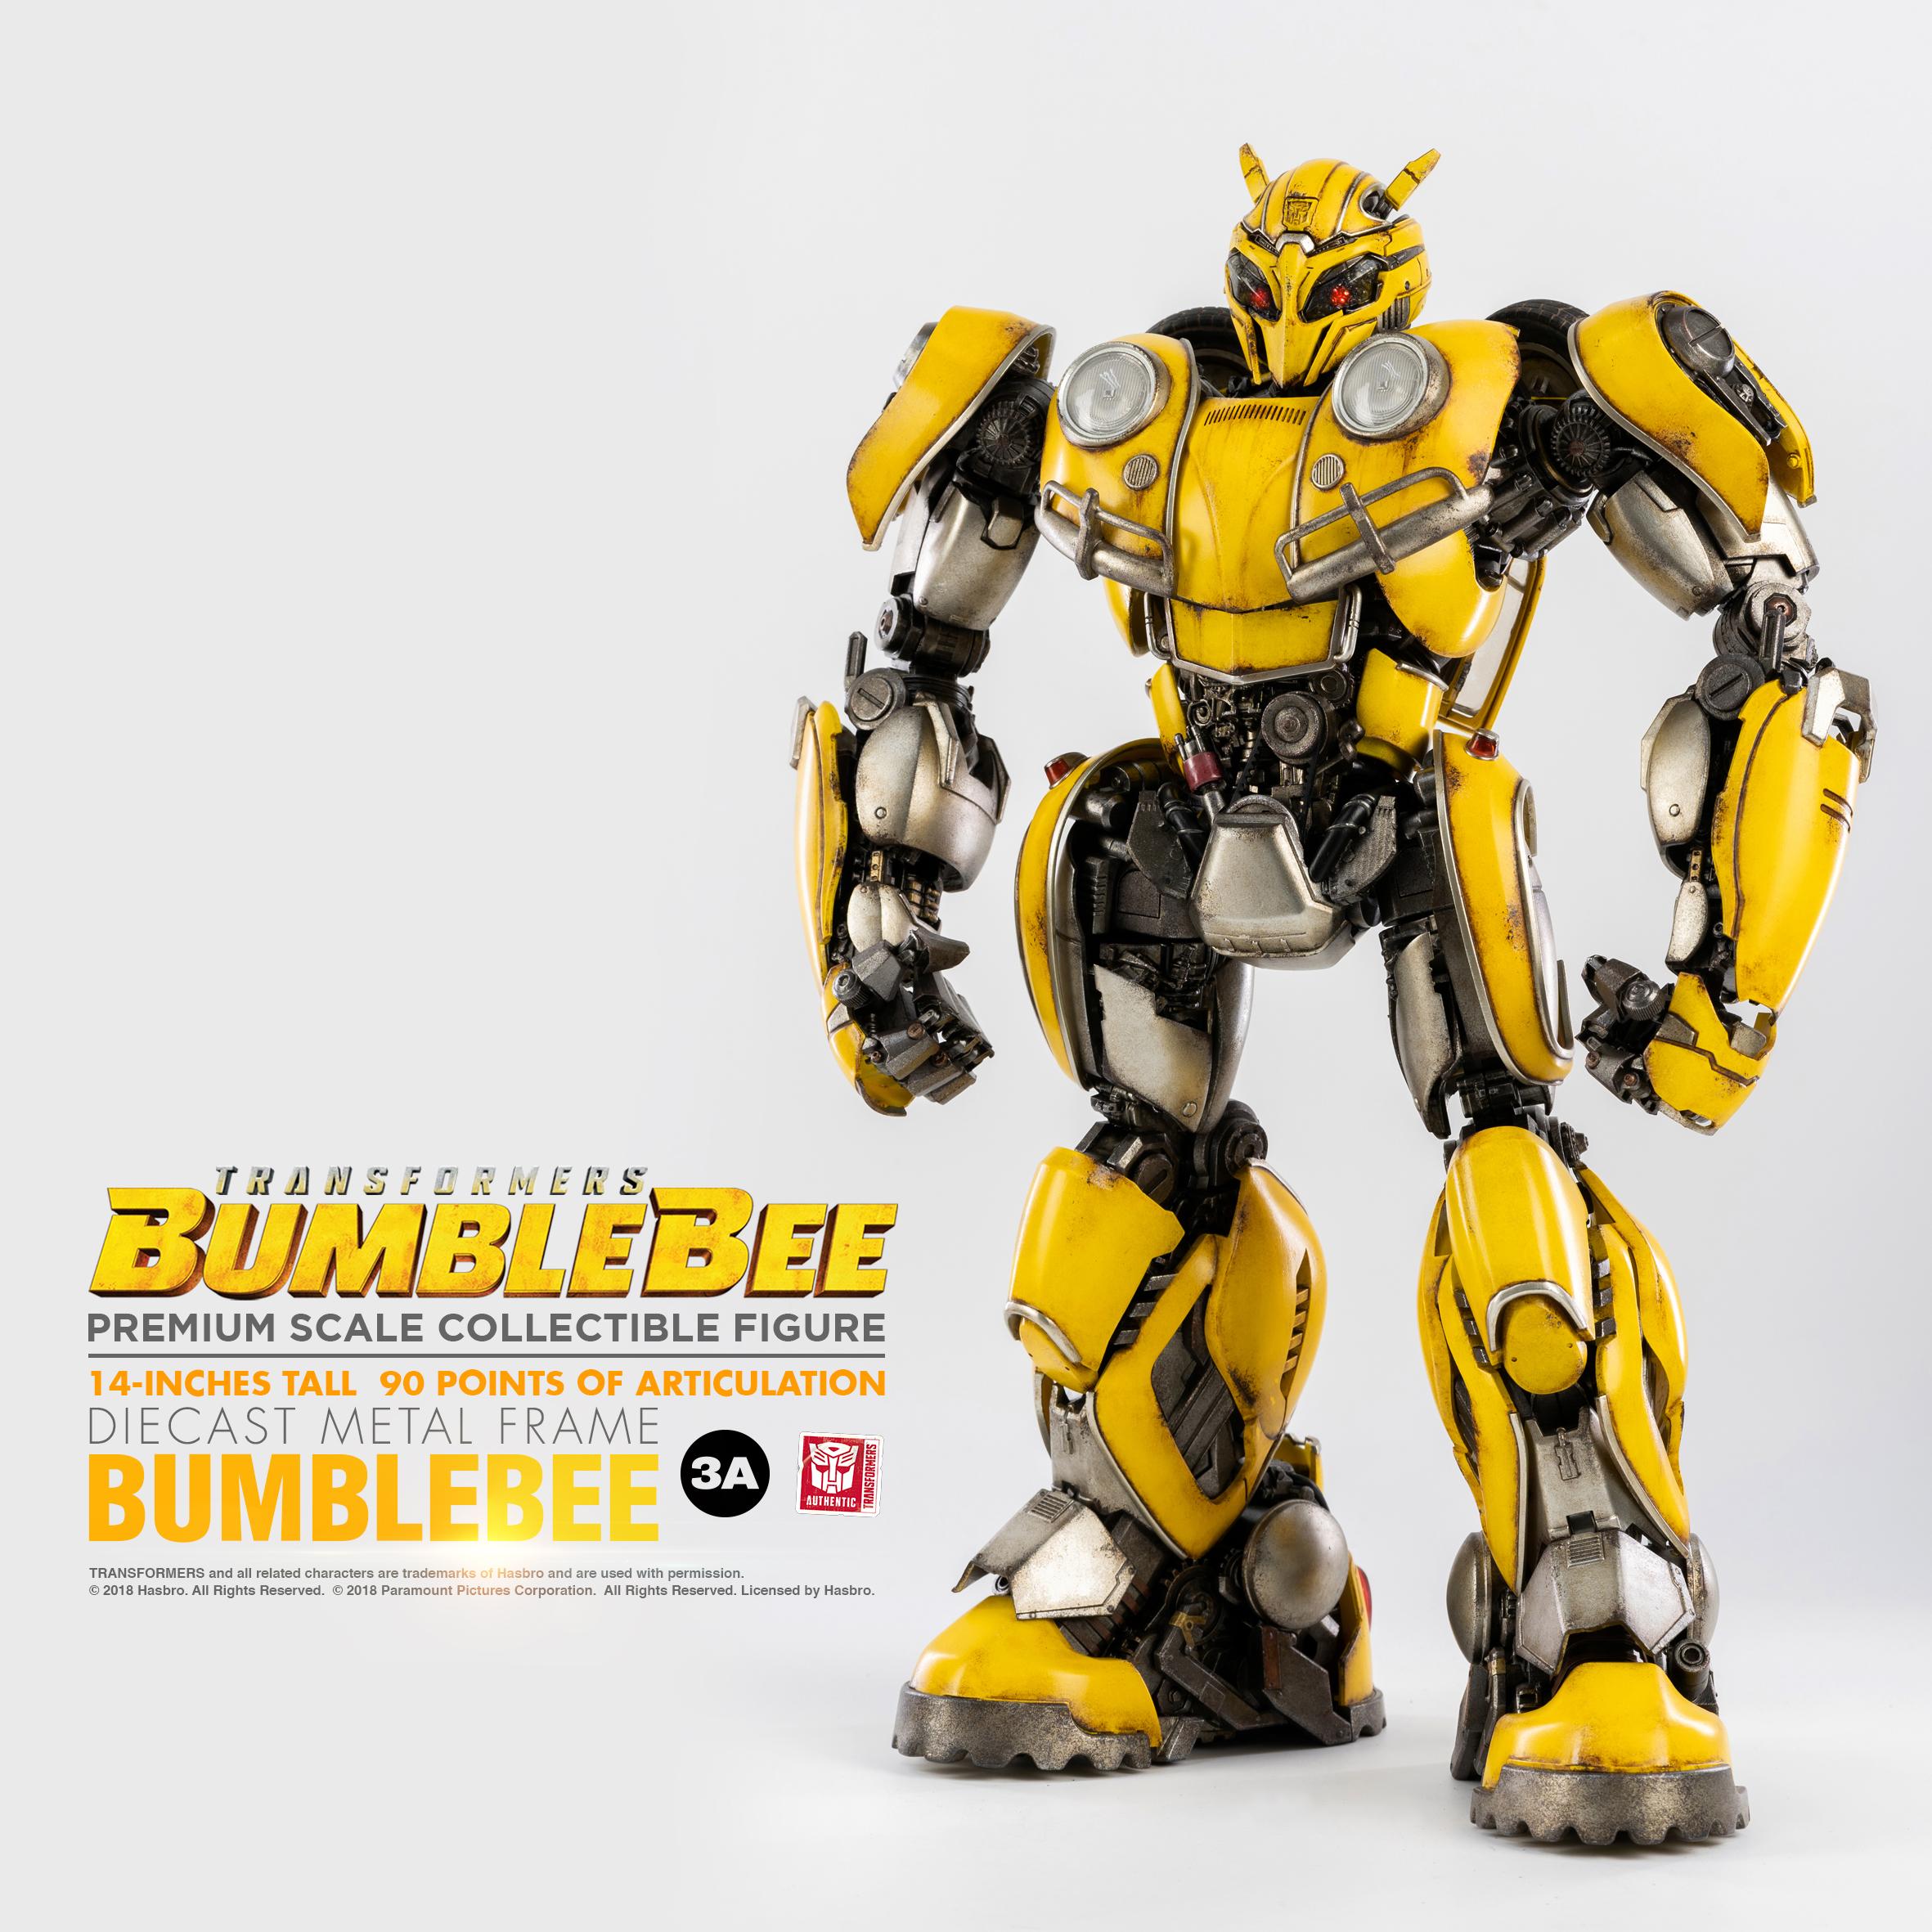 Bumblebee_ENG_PM_00025.jpg